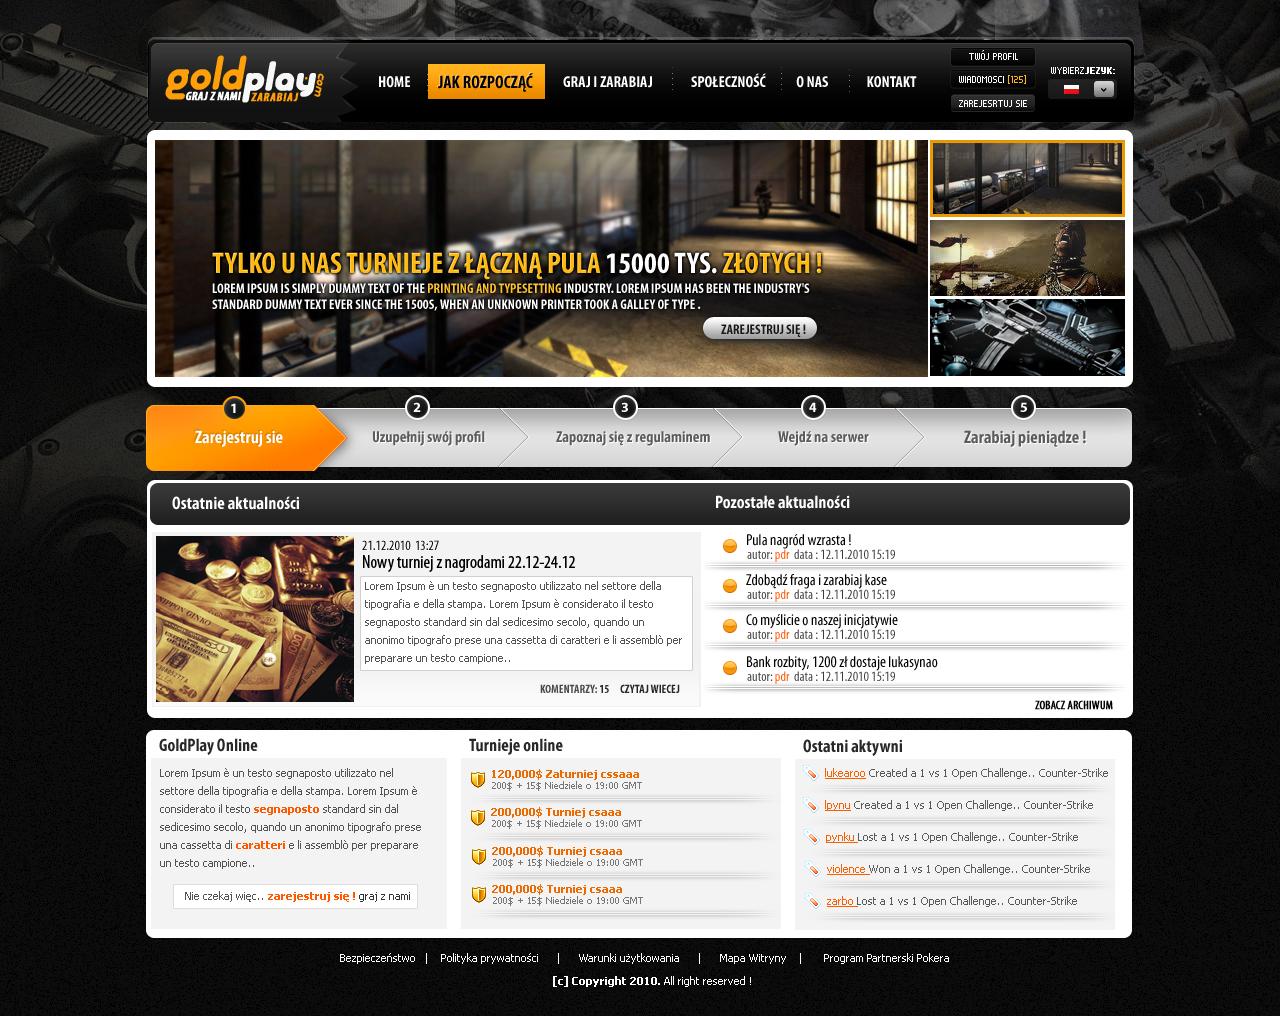 GoldPlay- CS tournaments by lukearoo